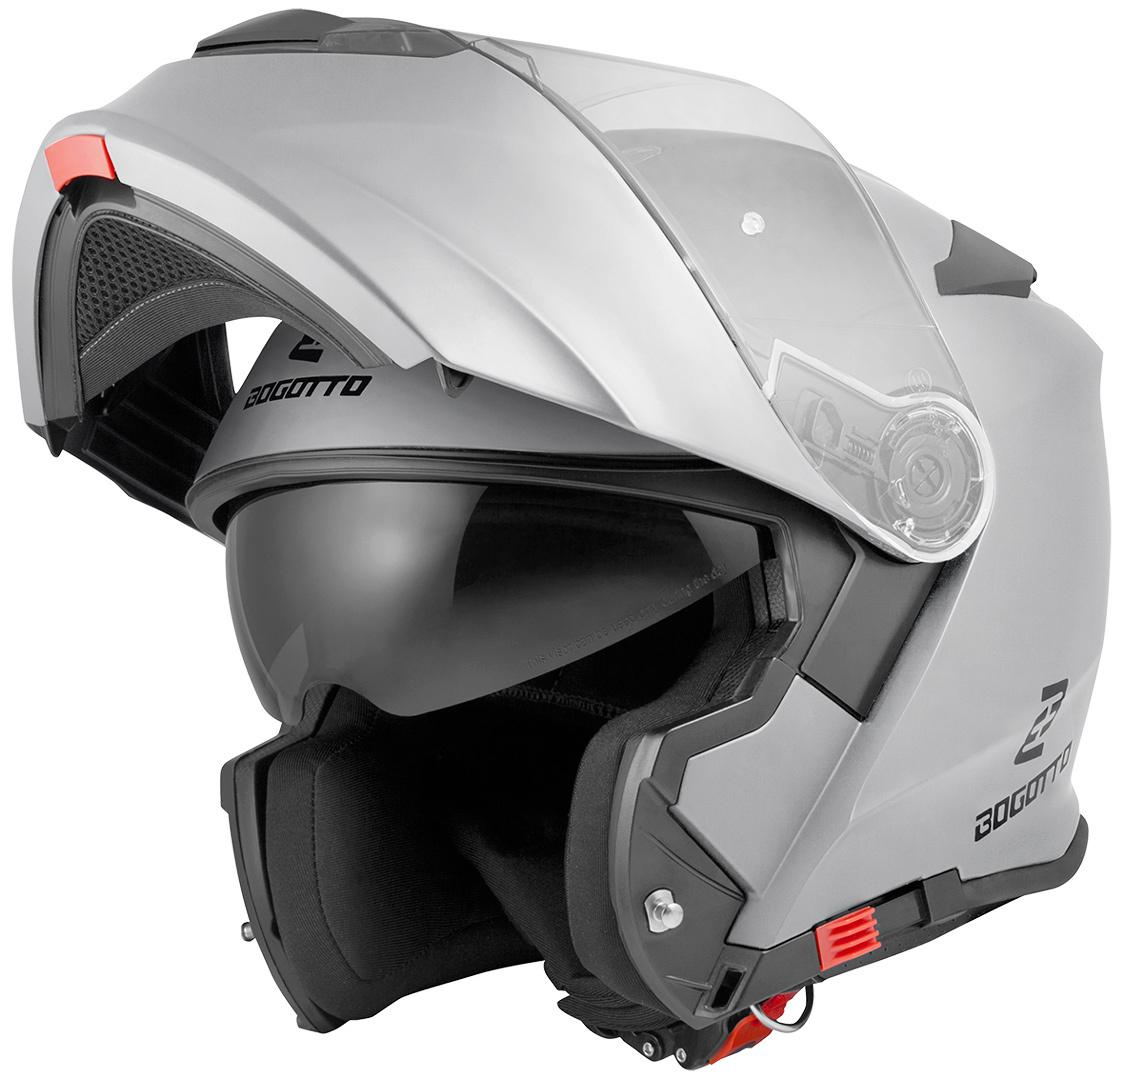 Bogotto V271 Motorrad Klapphelm, silber, Größe M, silber, Größe M